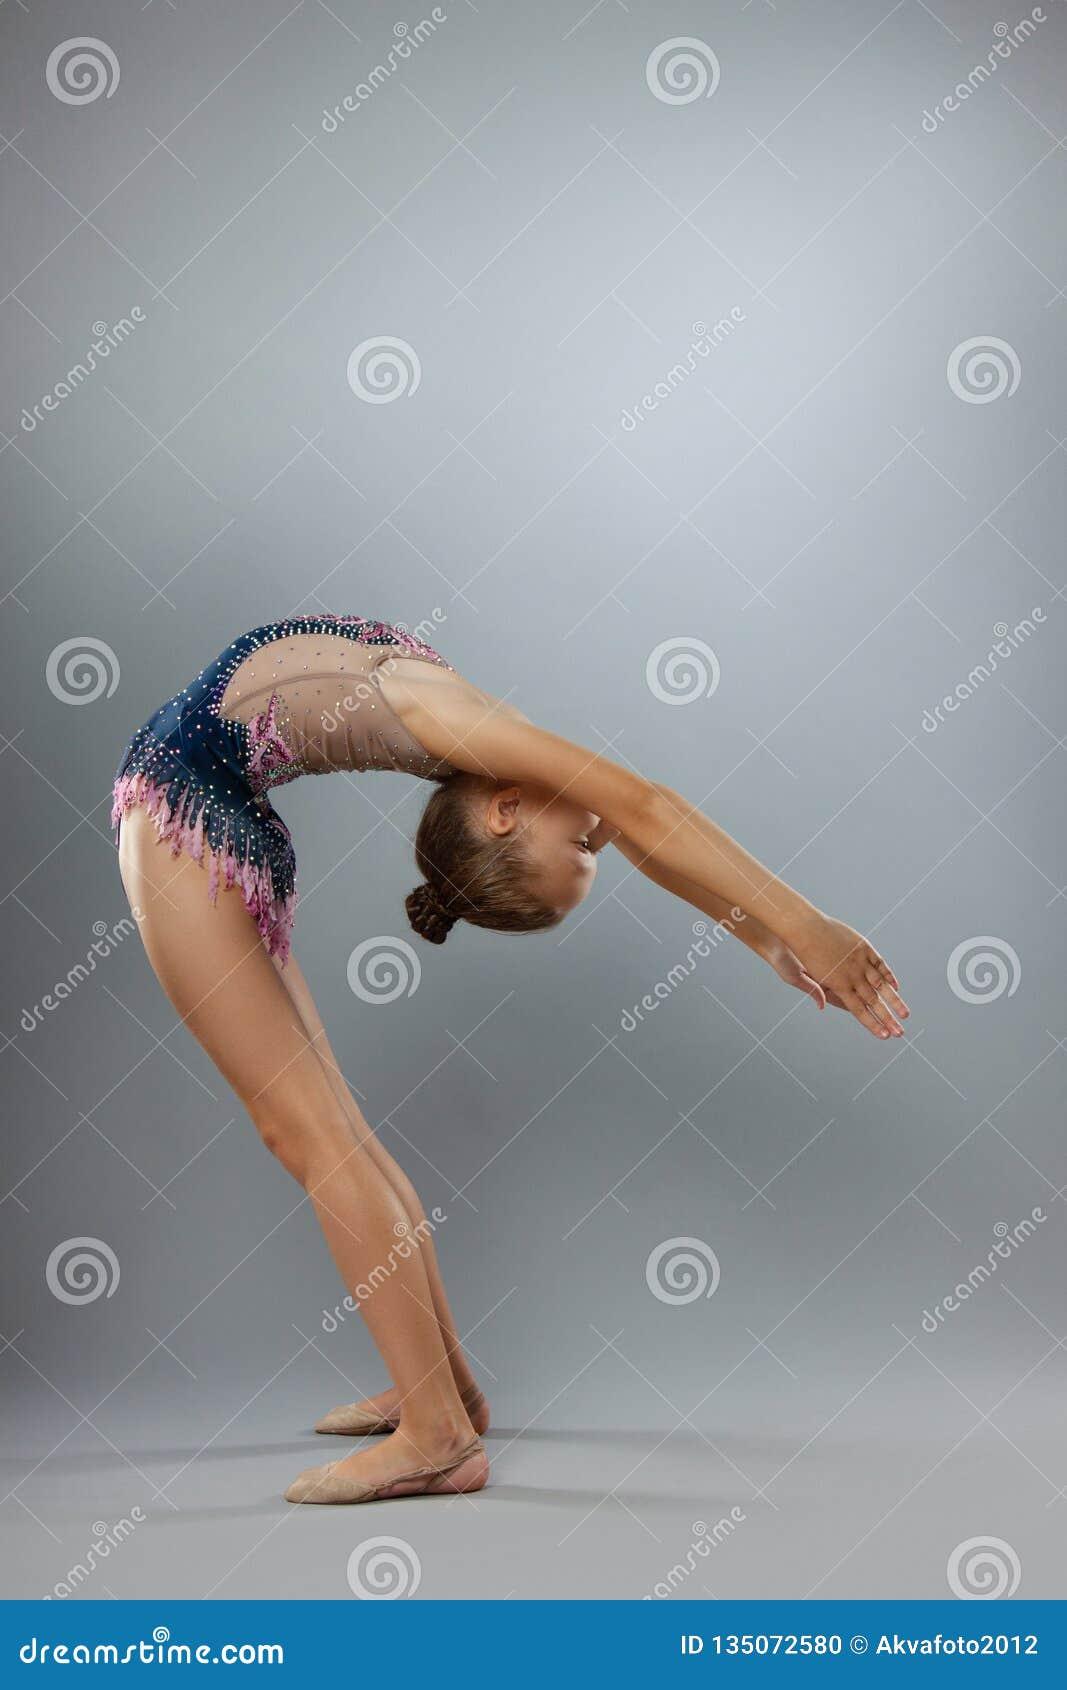 Really flexible gymnast